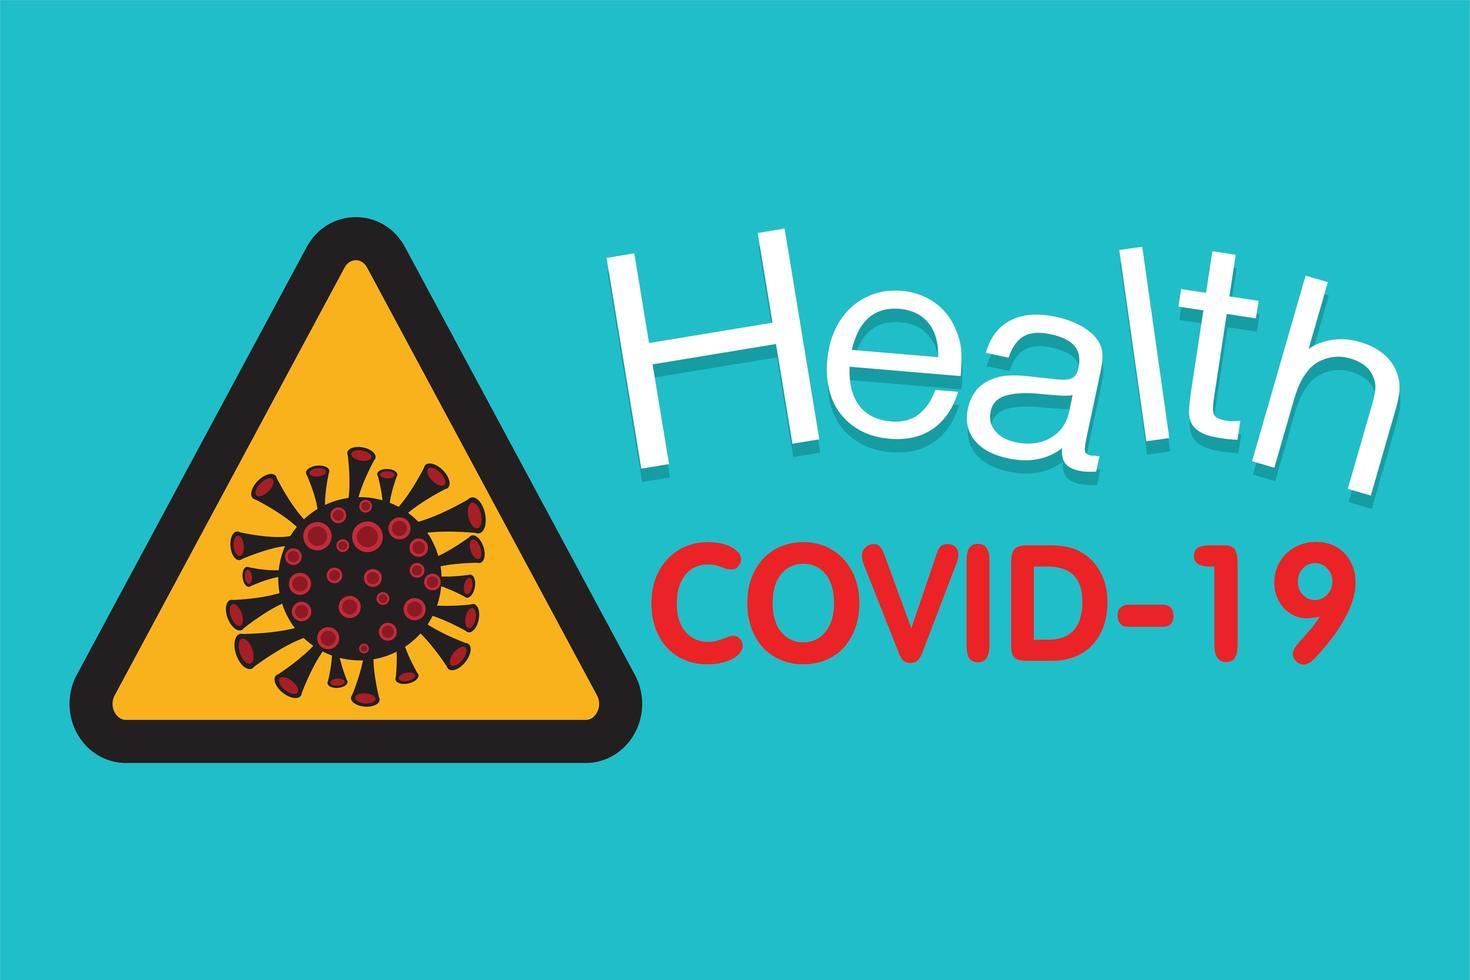 covid-19, coronavirus utbrott vektor design